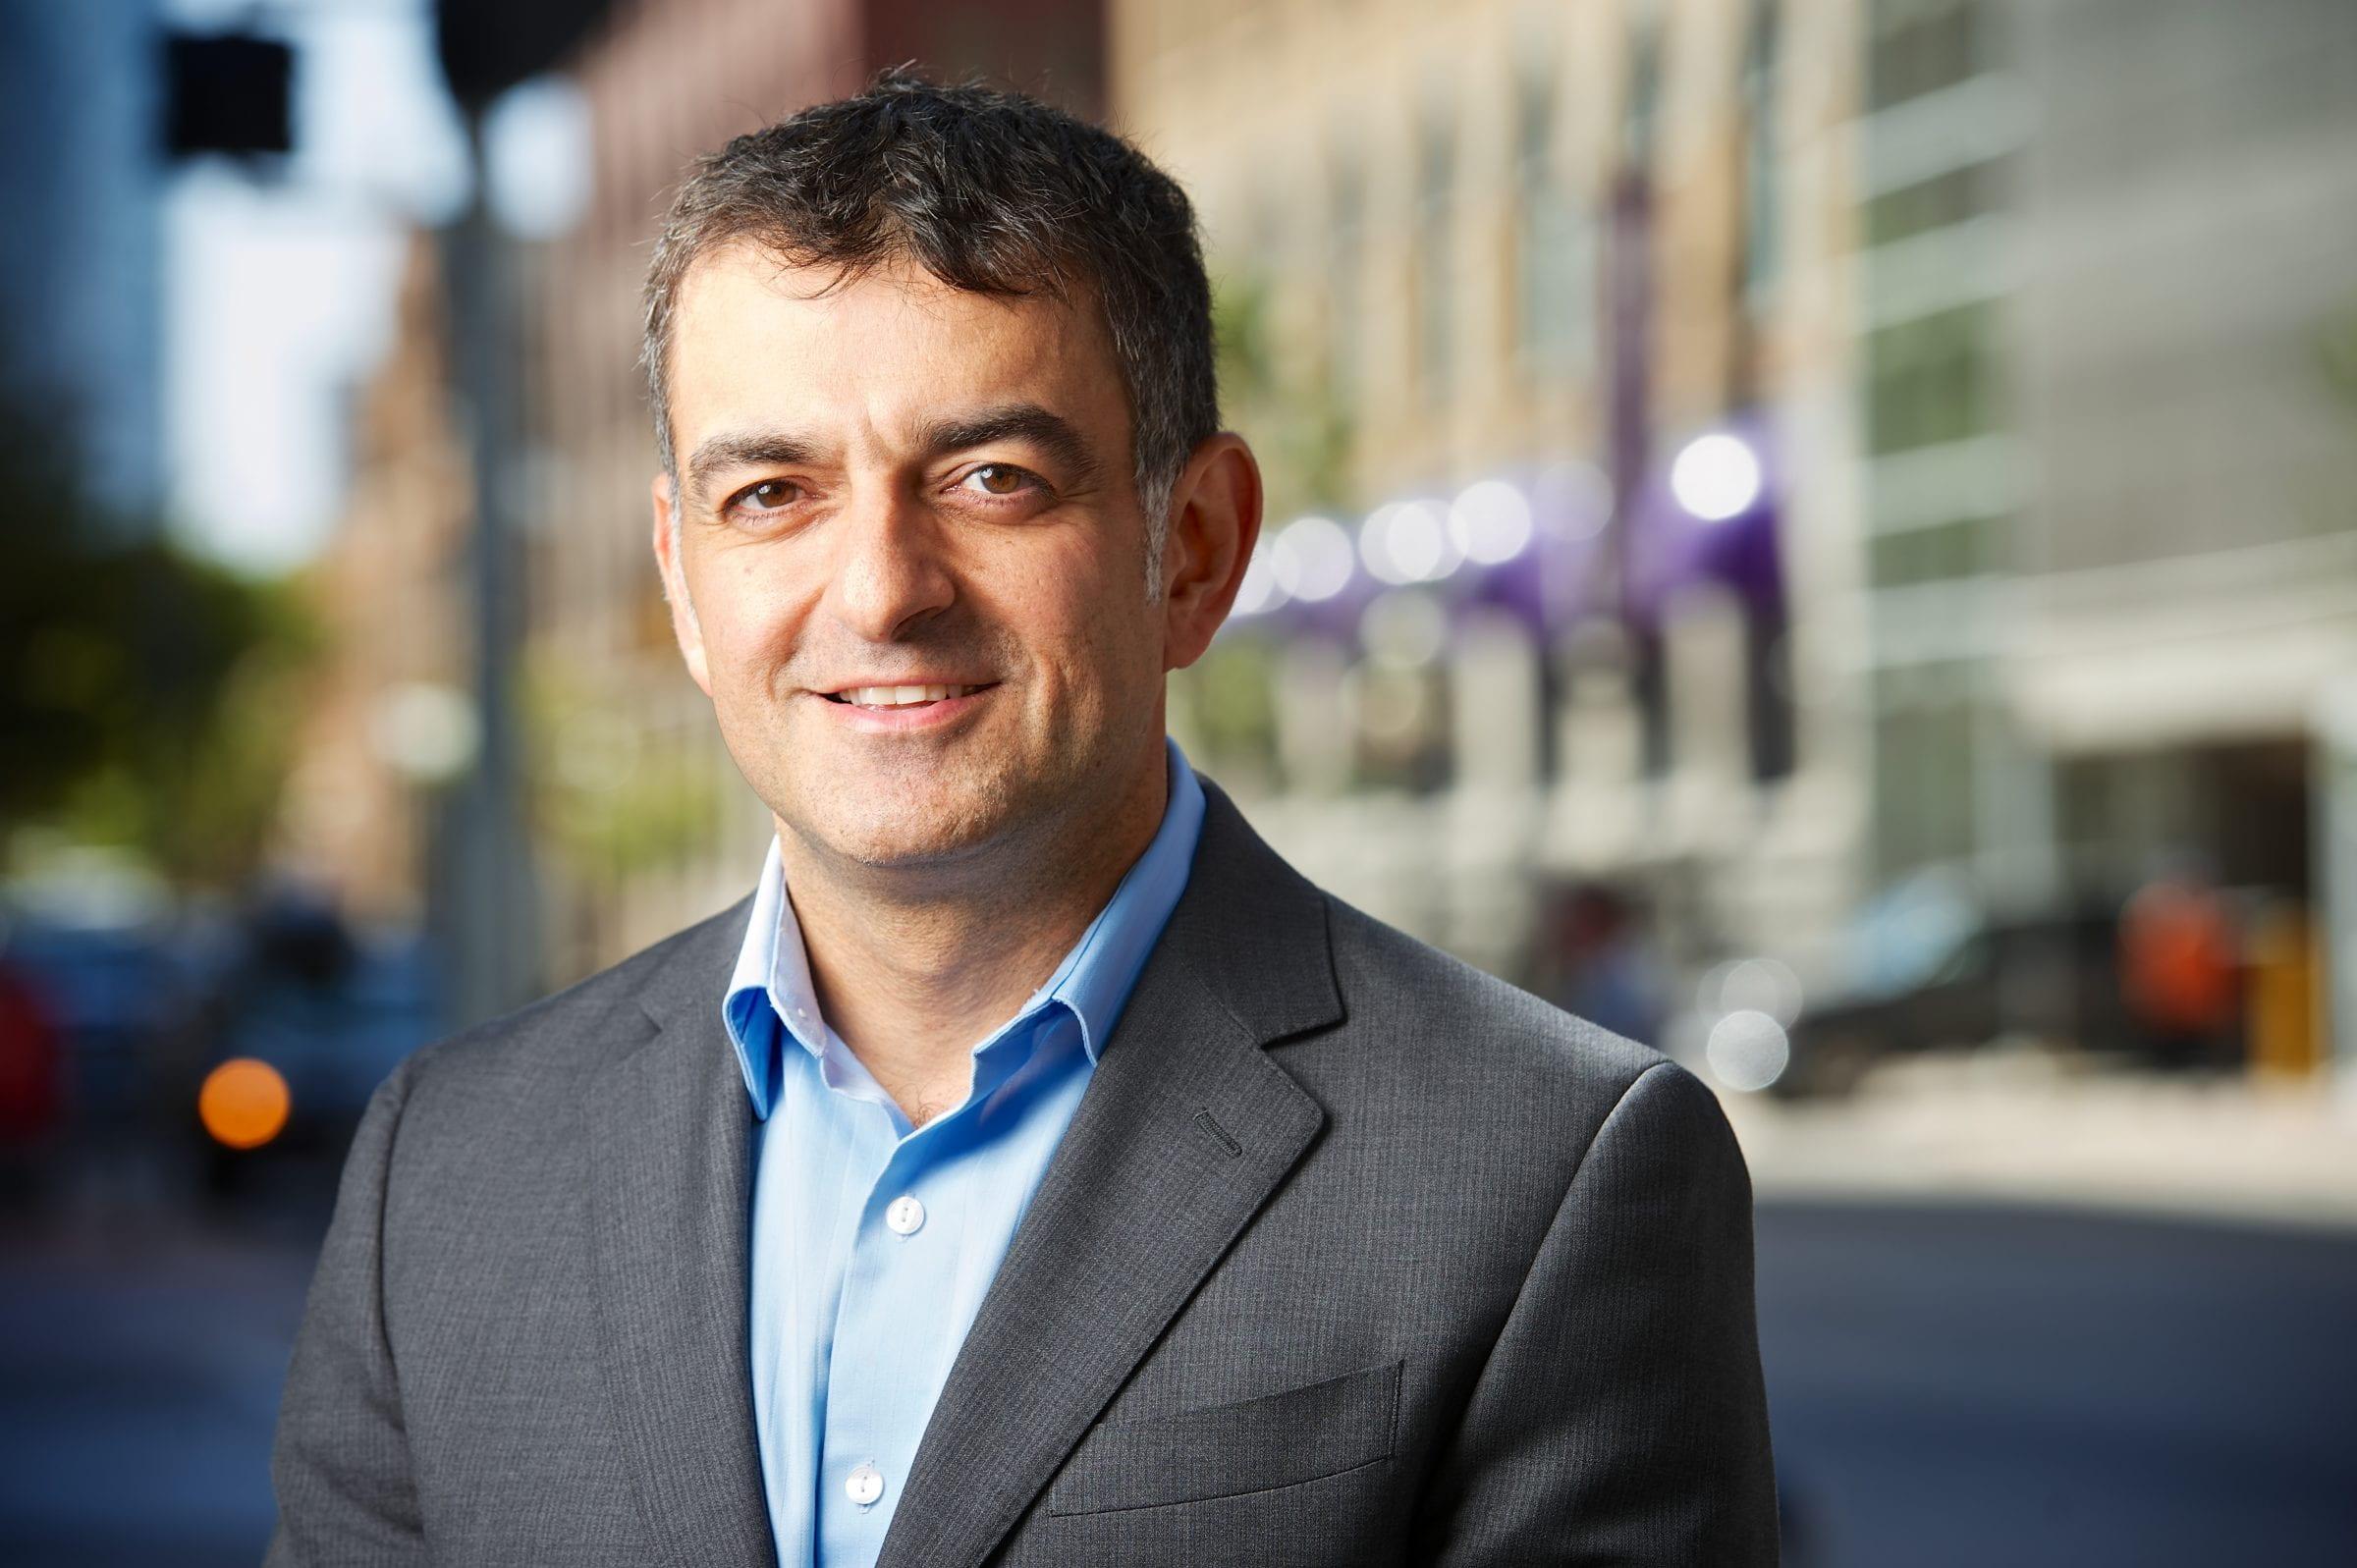 Louie Ghiz, Executive Director of New Media Manitoba